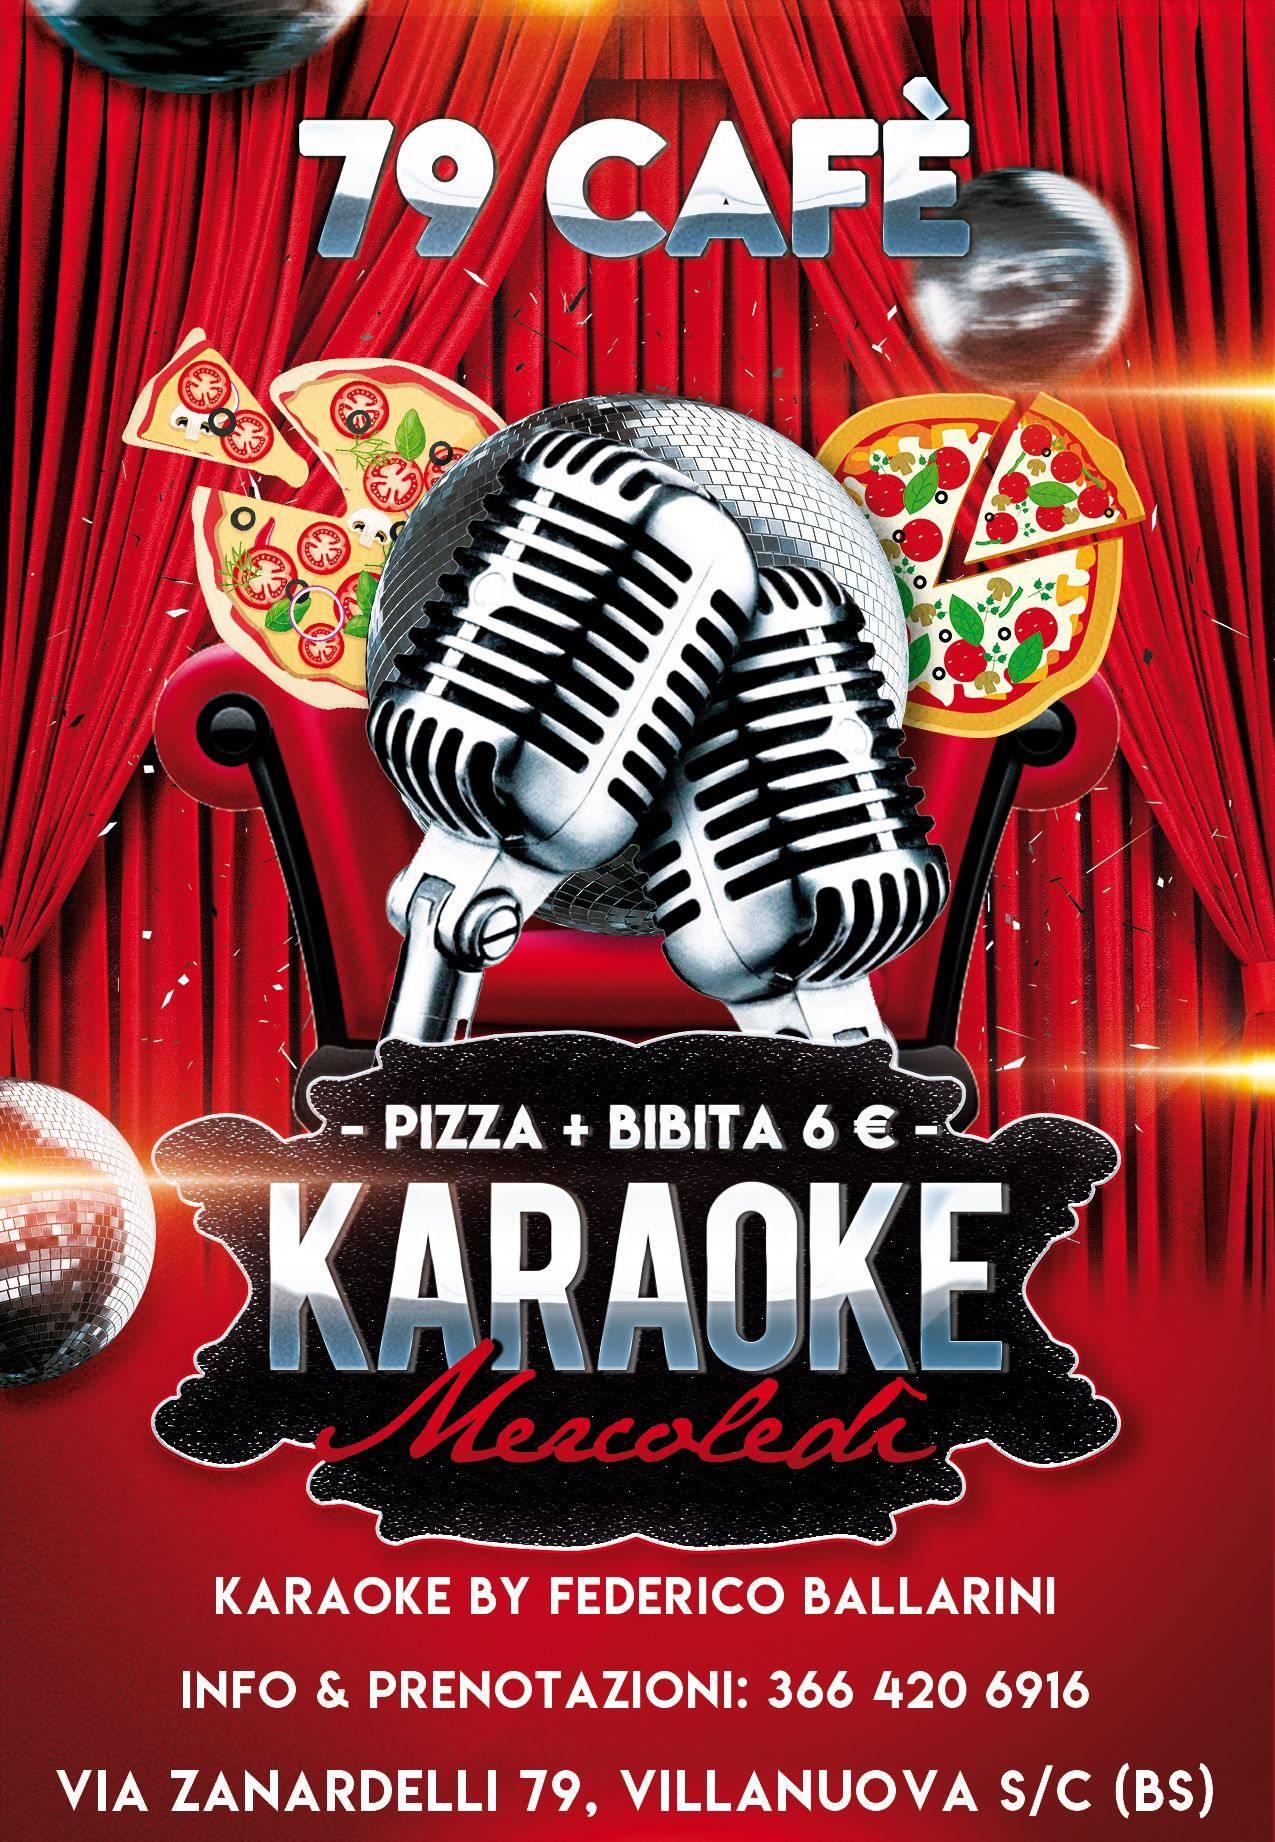 Mercoledì Karaoke